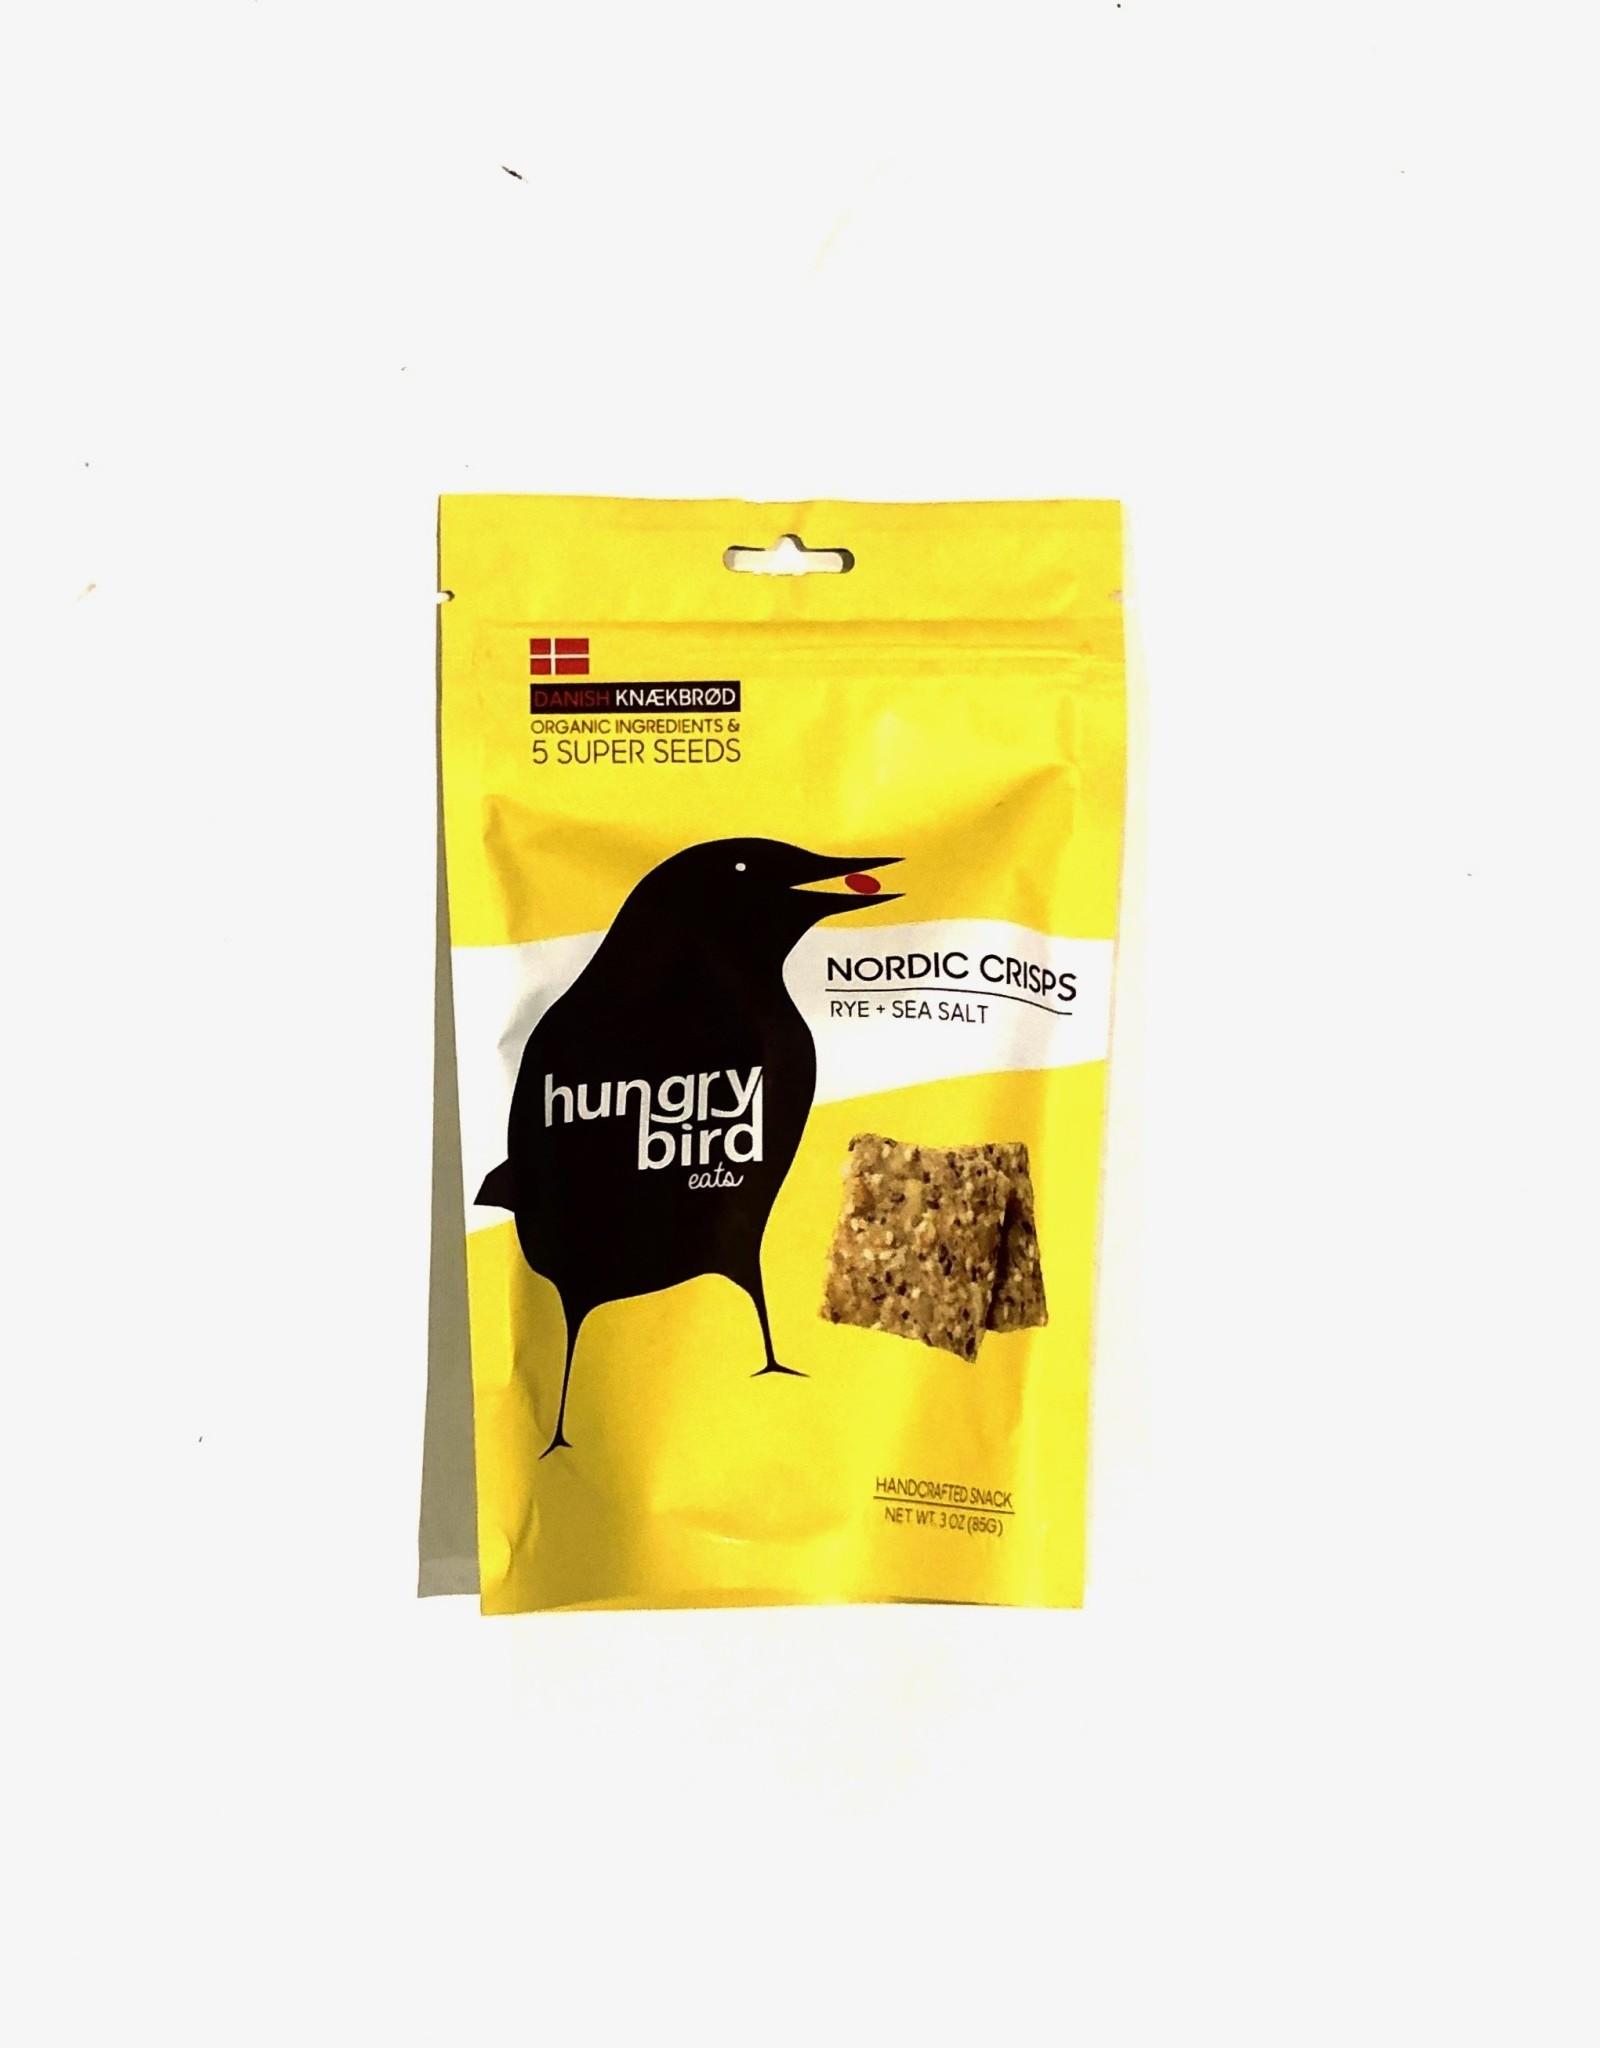 Hungry Bird Nordic crisps 3oz